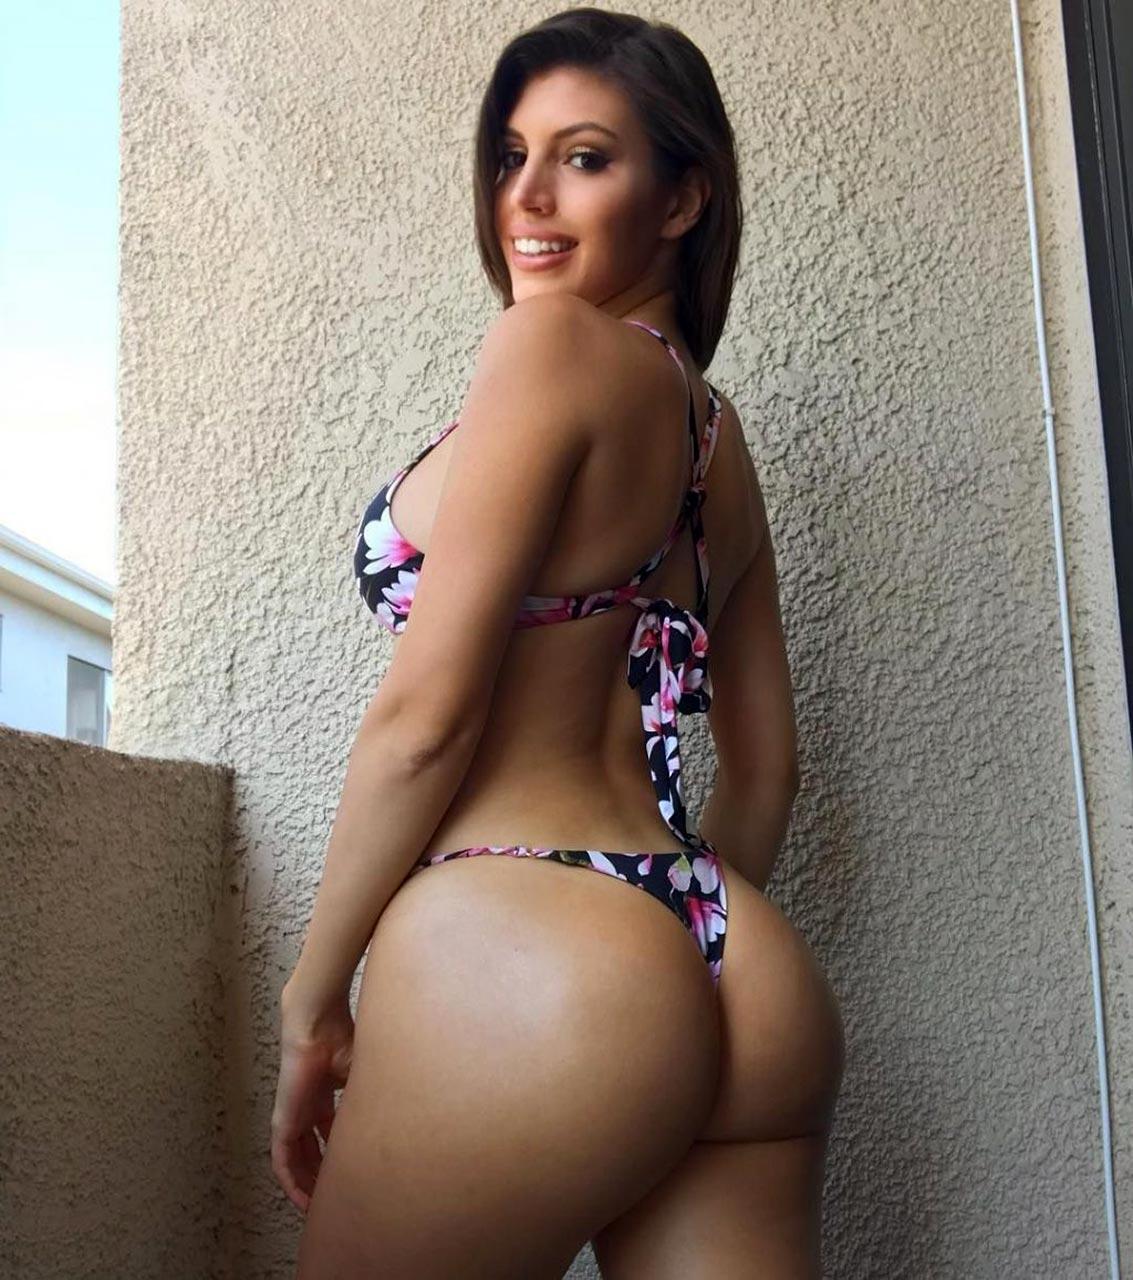 miles hernandez hot topless photos